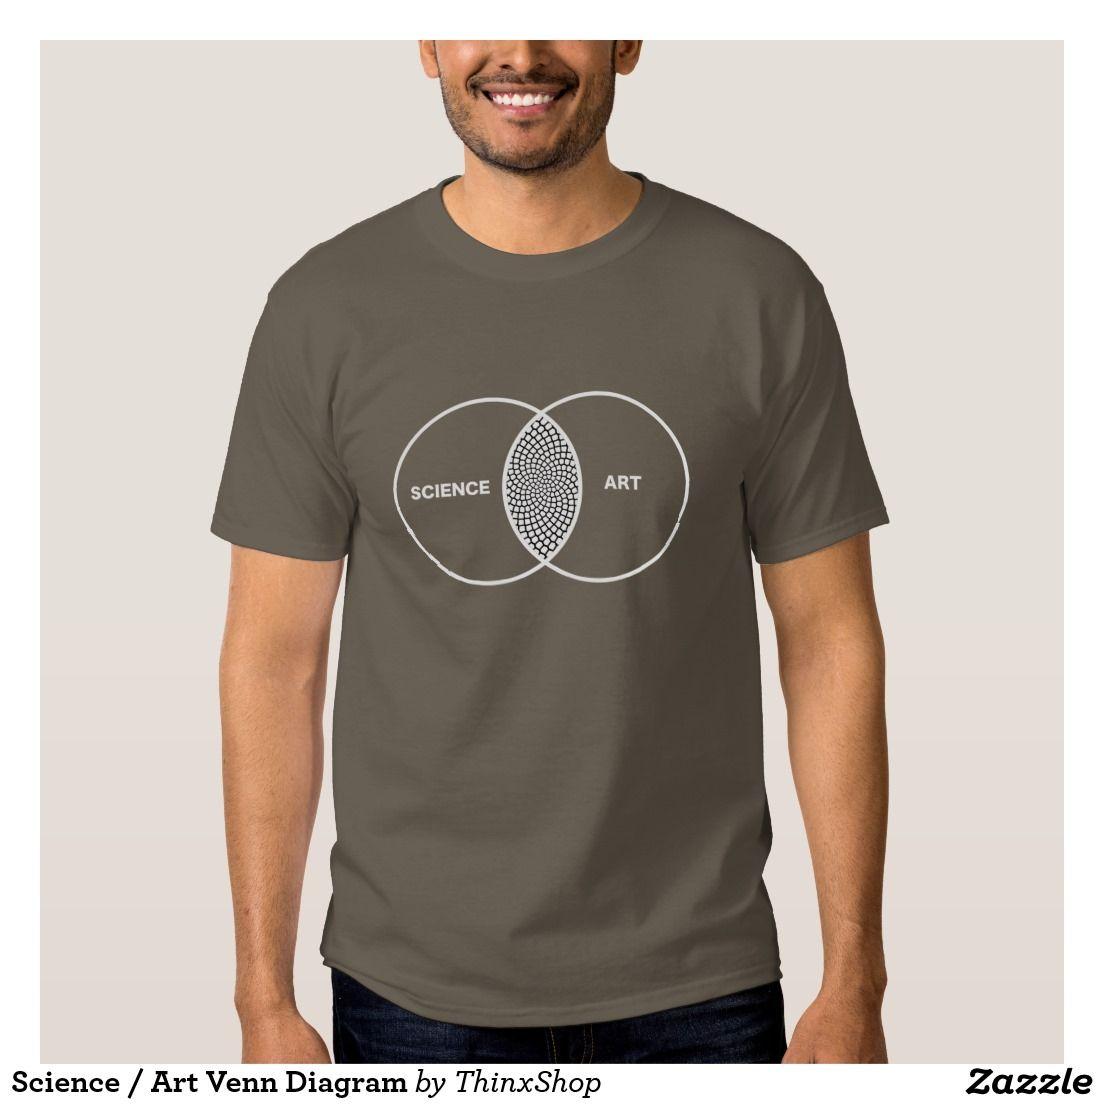 Science art venn diagram t shirt venn diagrams science art science art venn diagram t shirt pooptronica